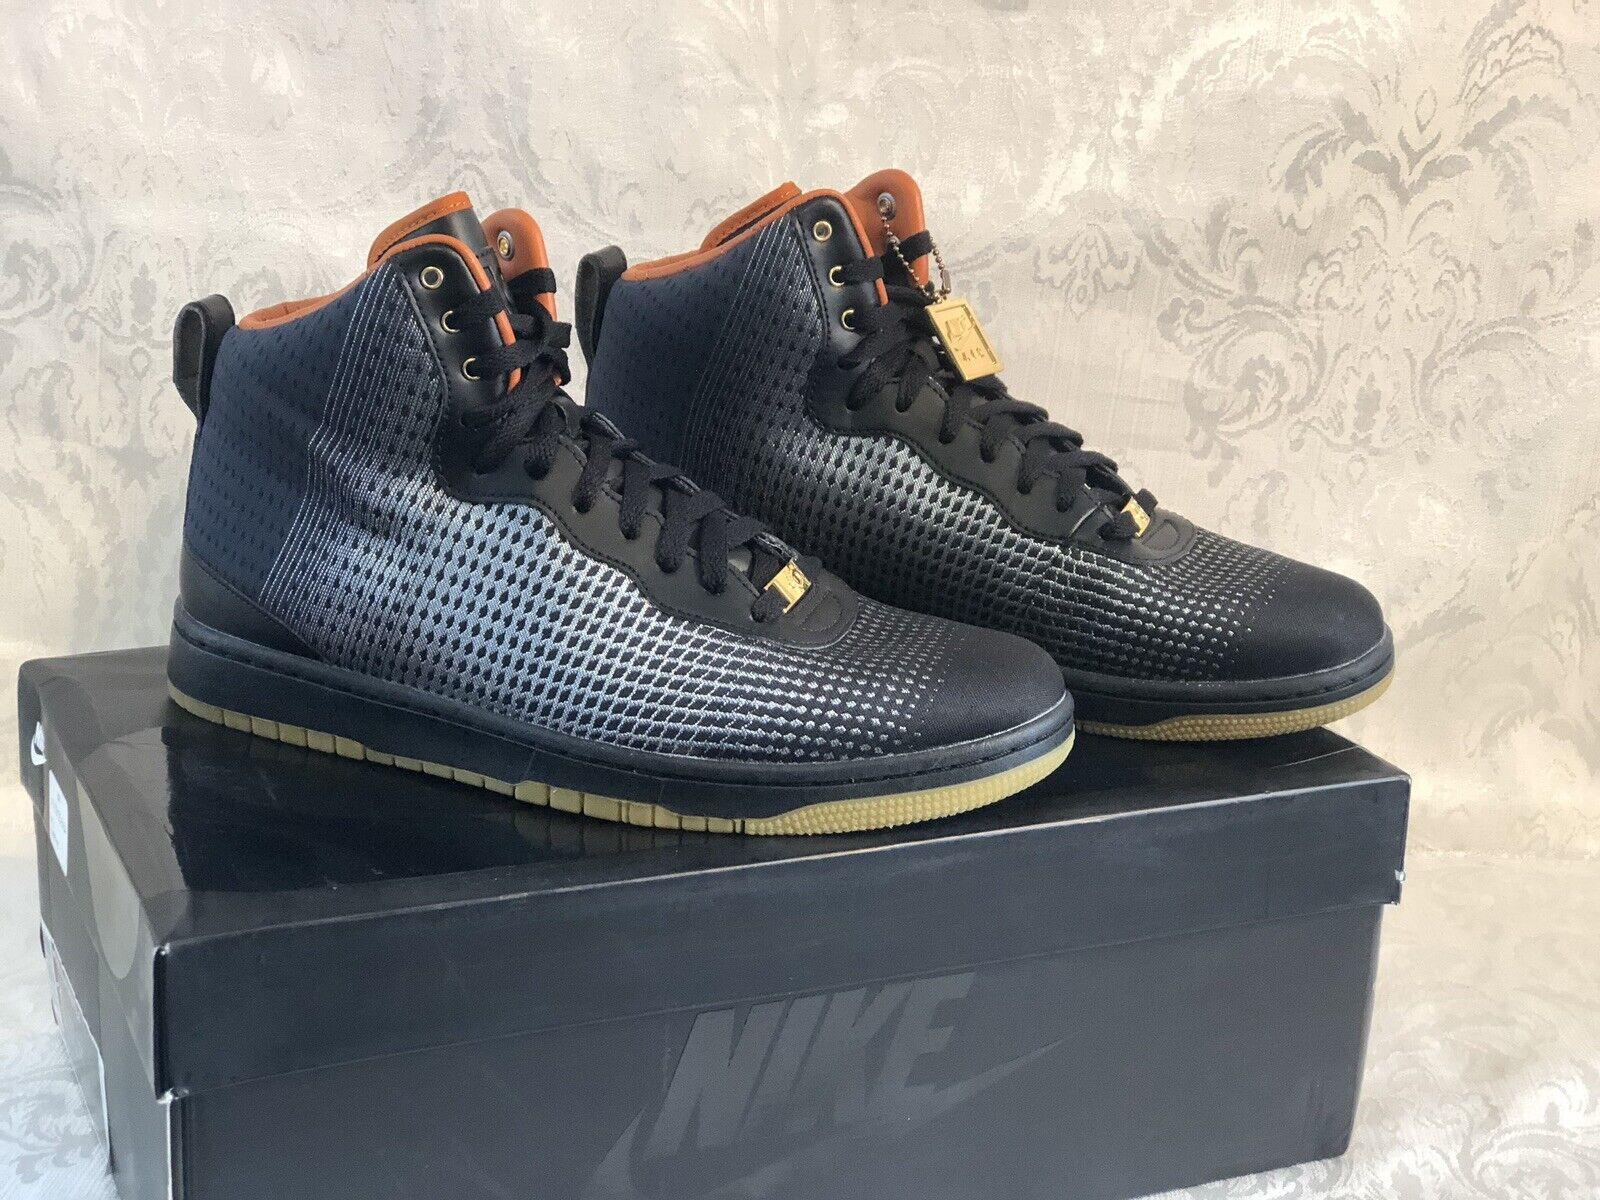 New Men's Sz 11 Nike KD VIII Kevin Durant 8 shoes NSW Lifestyle 749637-001 Black